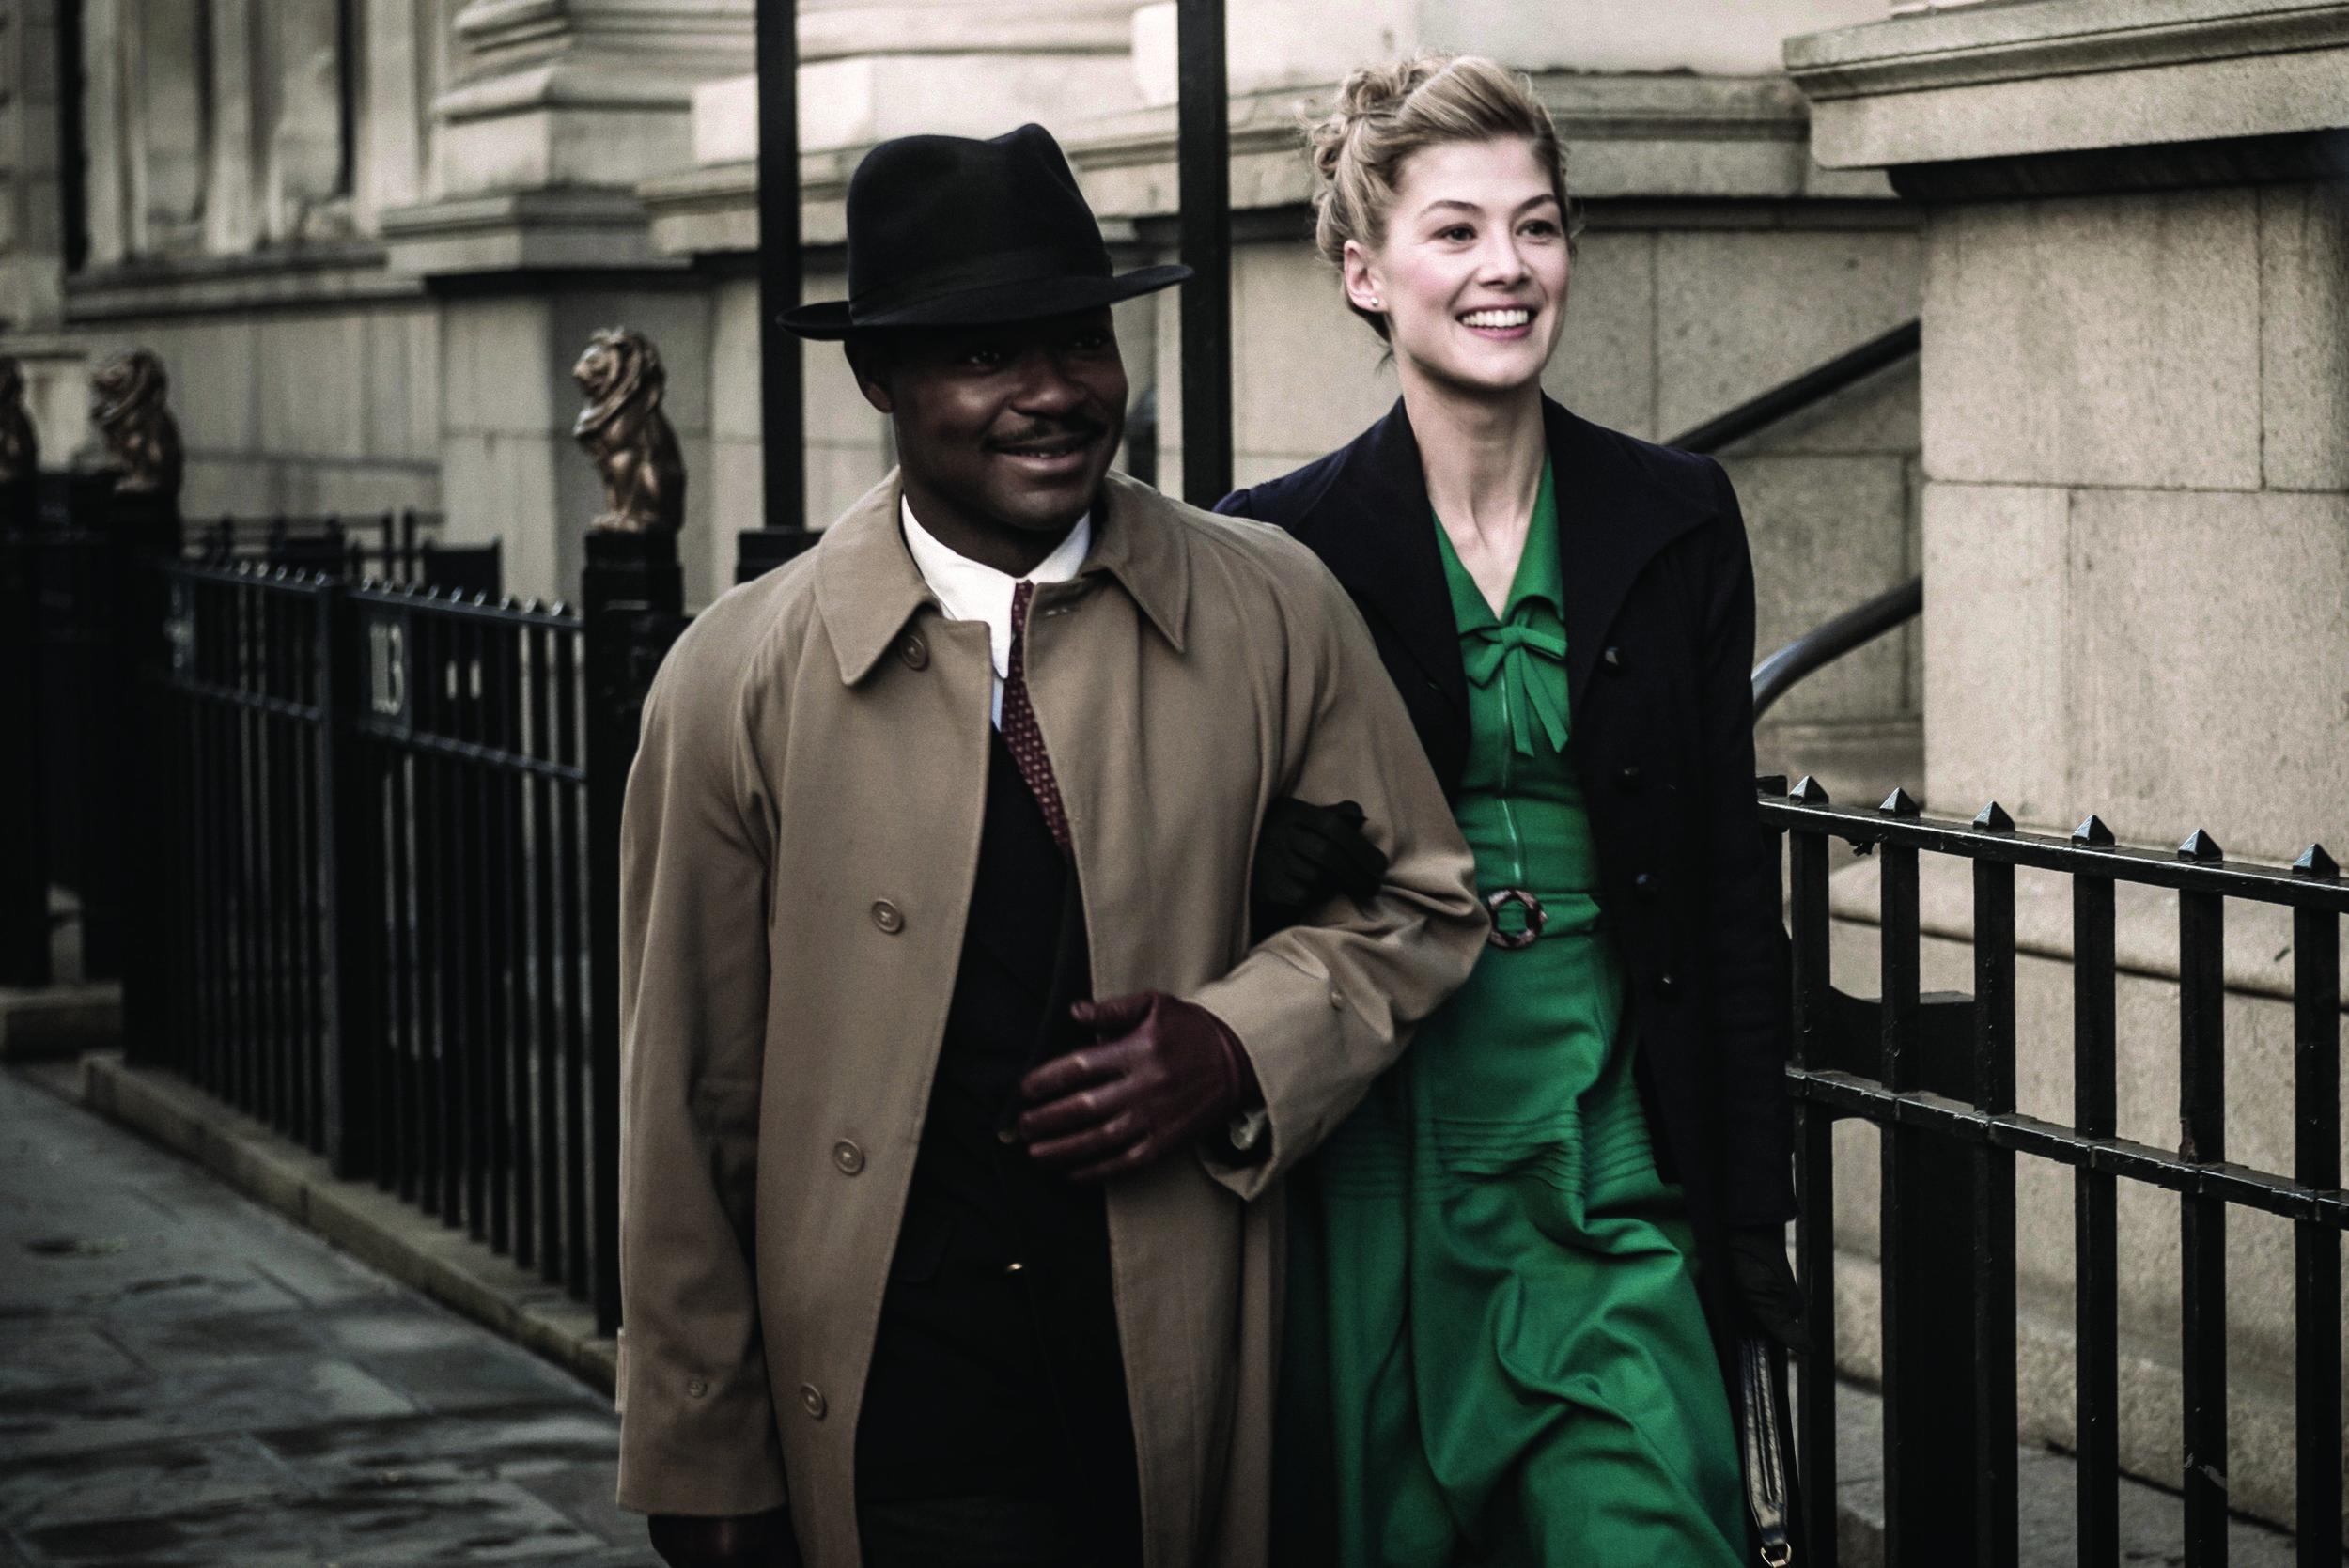 Image: Oyelowo and Pike in  A United Kingdom